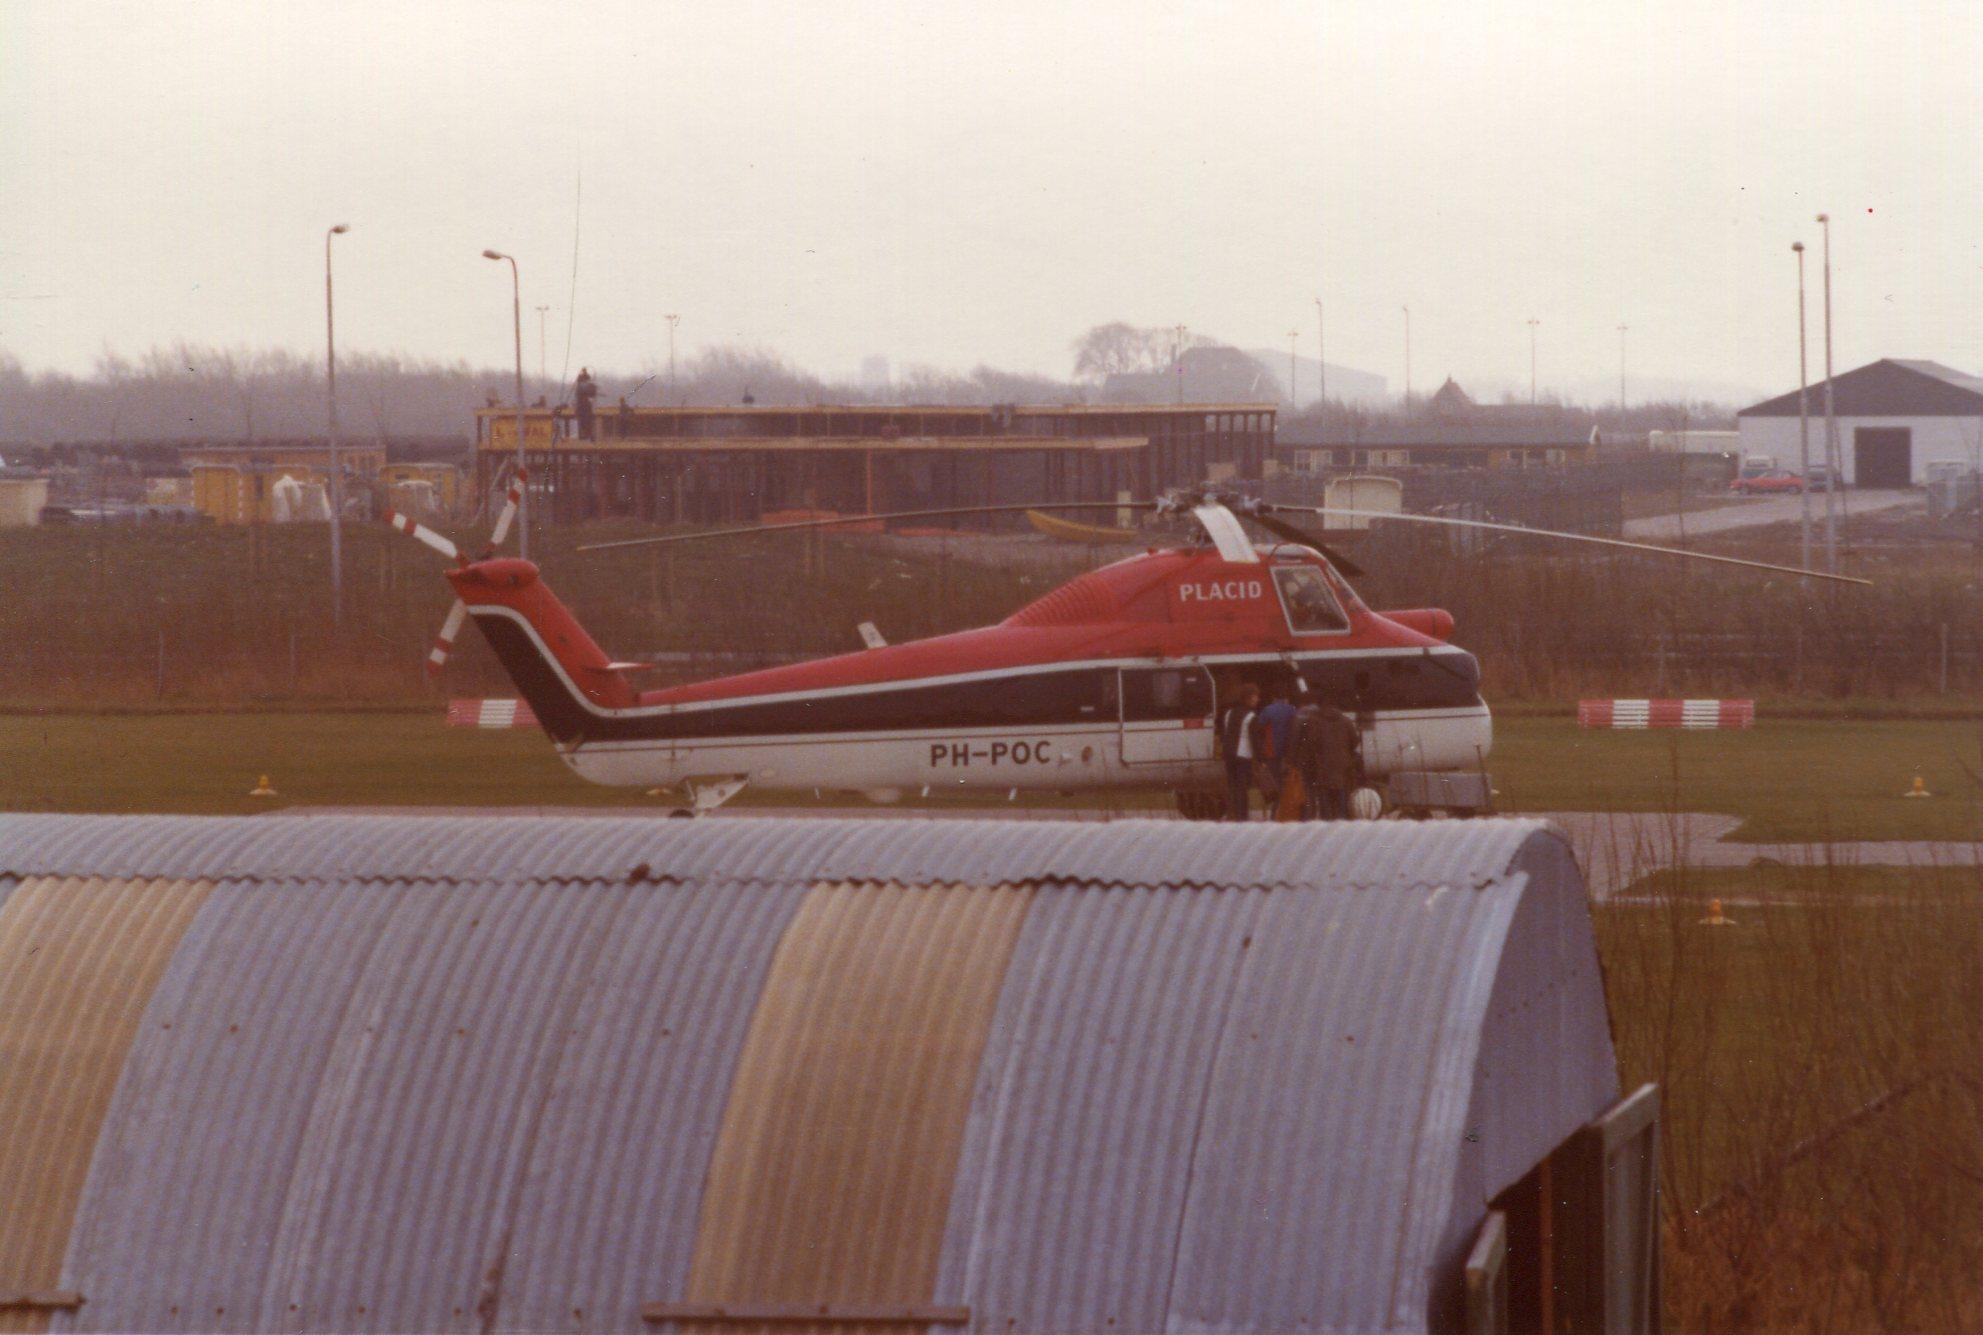 Naam: Den Helder , april 1977 (2).jpg Bekeken: 237 Grootte: 271,9 KB